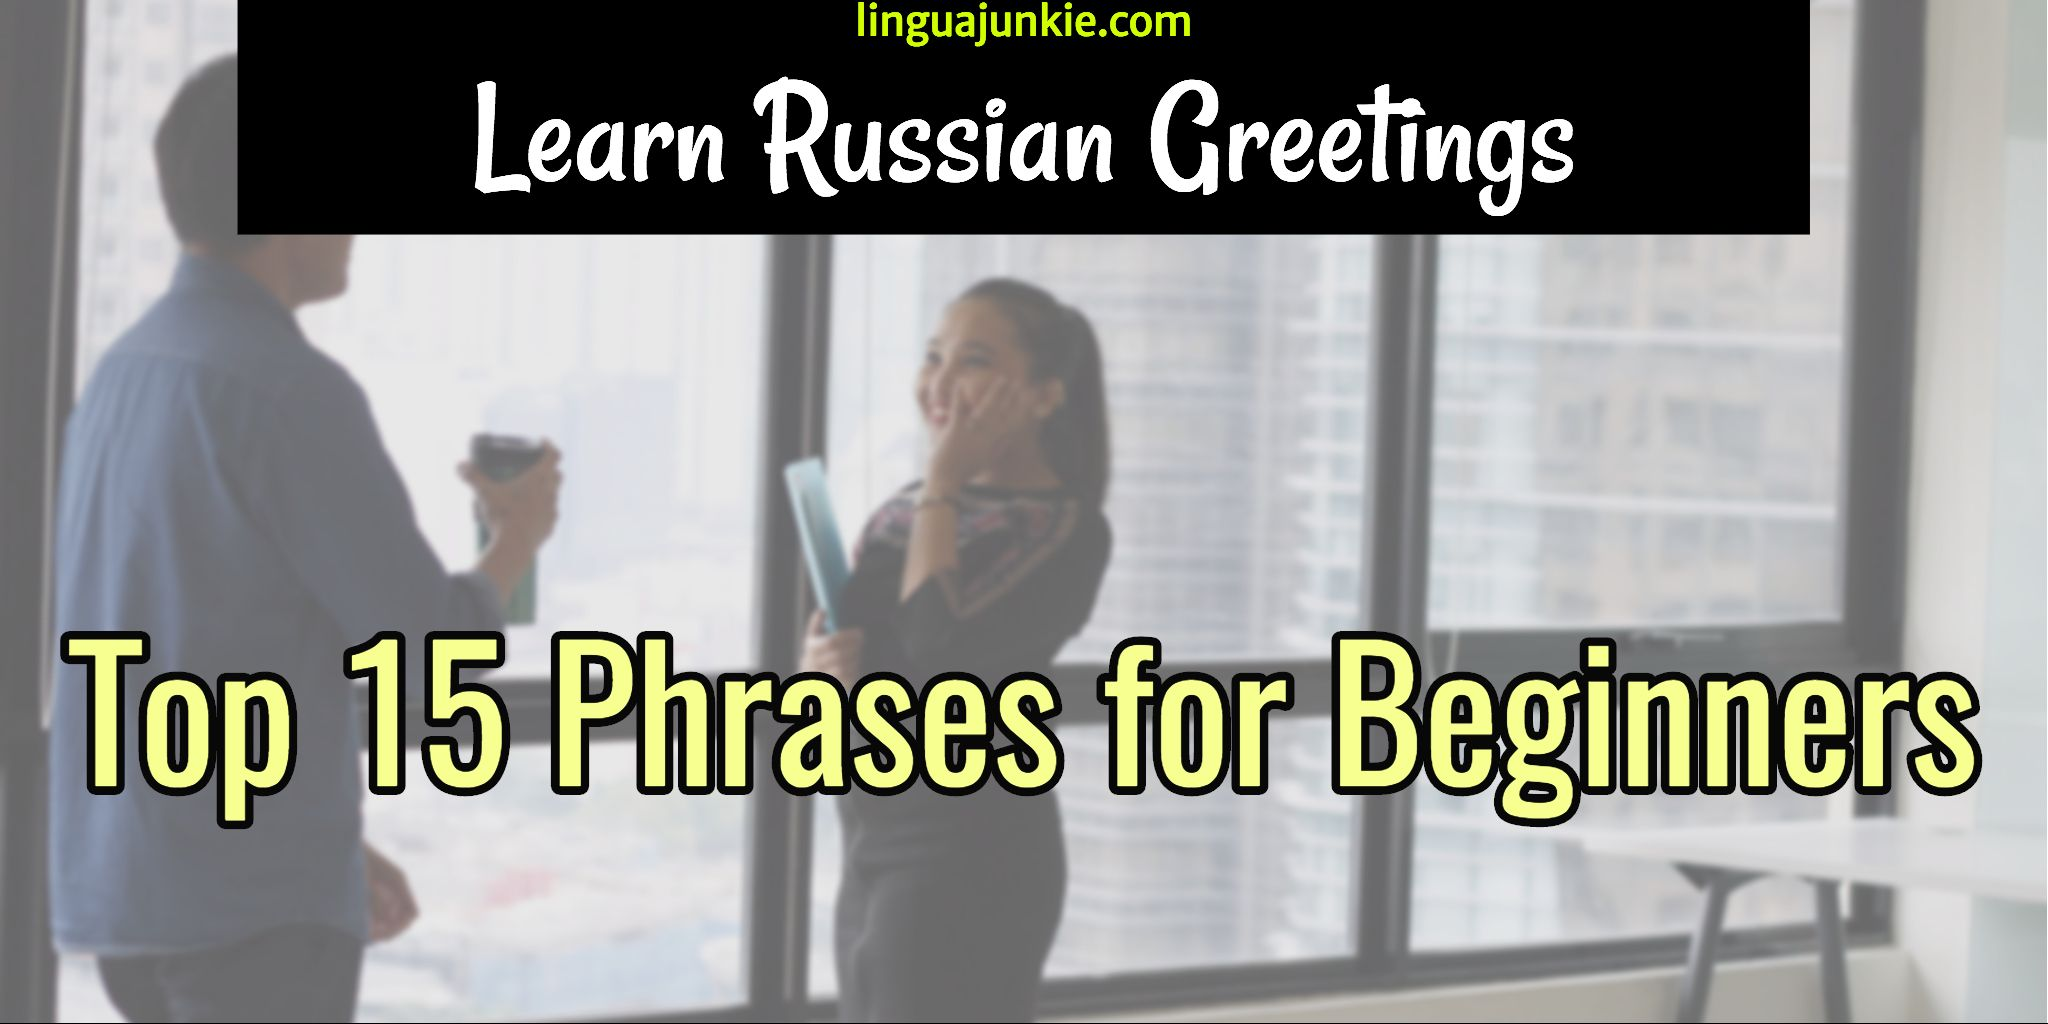 Learn russian linguajunkie learn russian greetings top 15 learn russian linguajunkie learn russian greetings top 15 phrases for beginners kristyandbryce Gallery